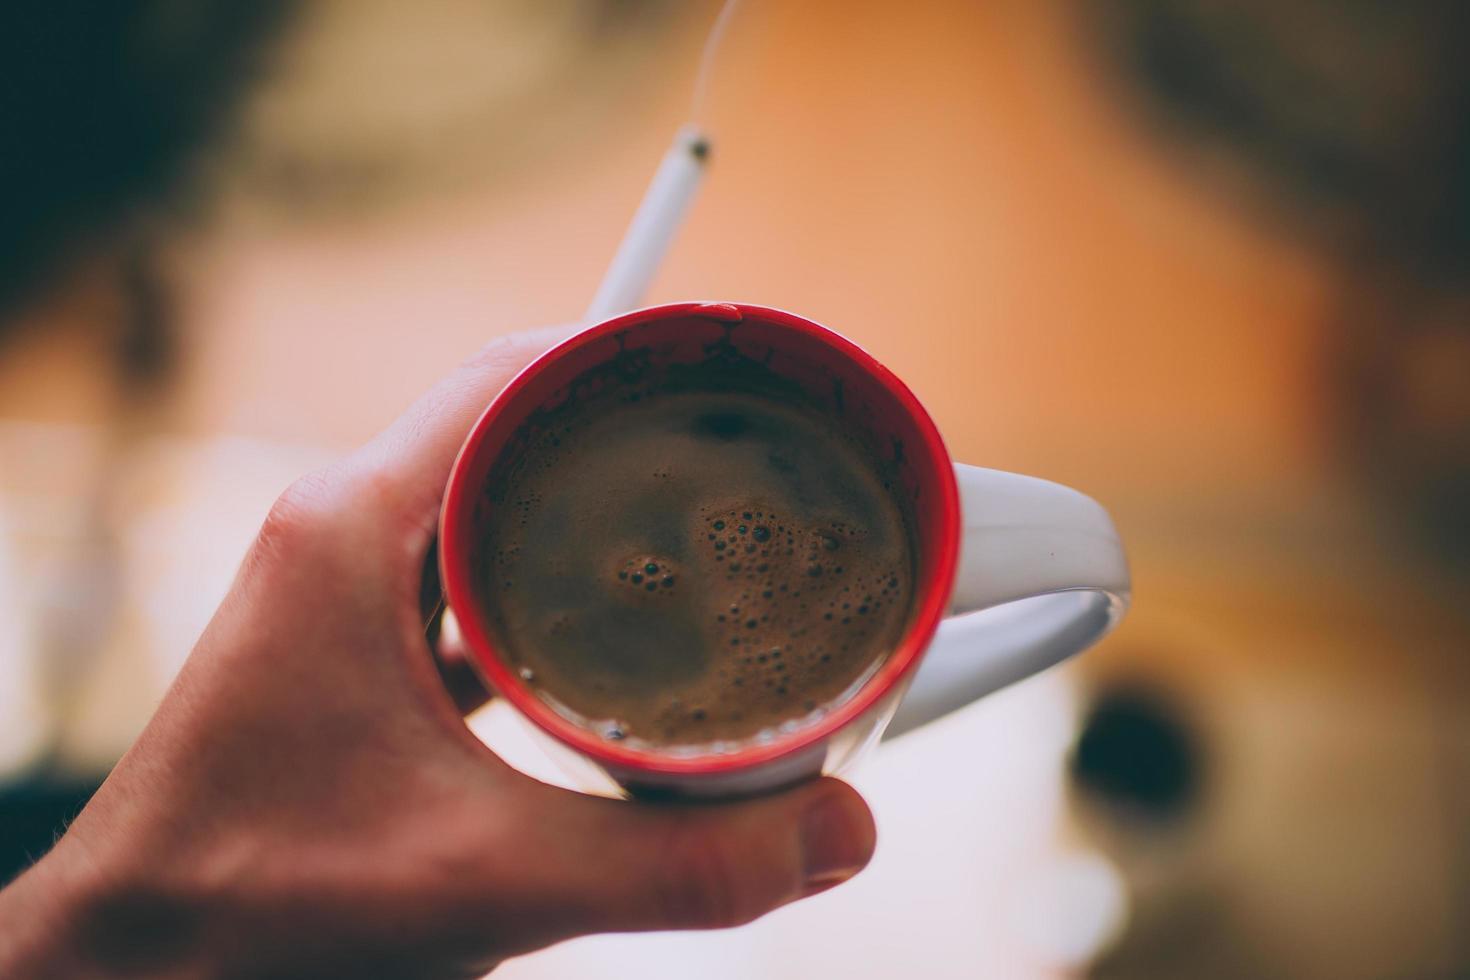 hand met sigaret en koffie in mok foto